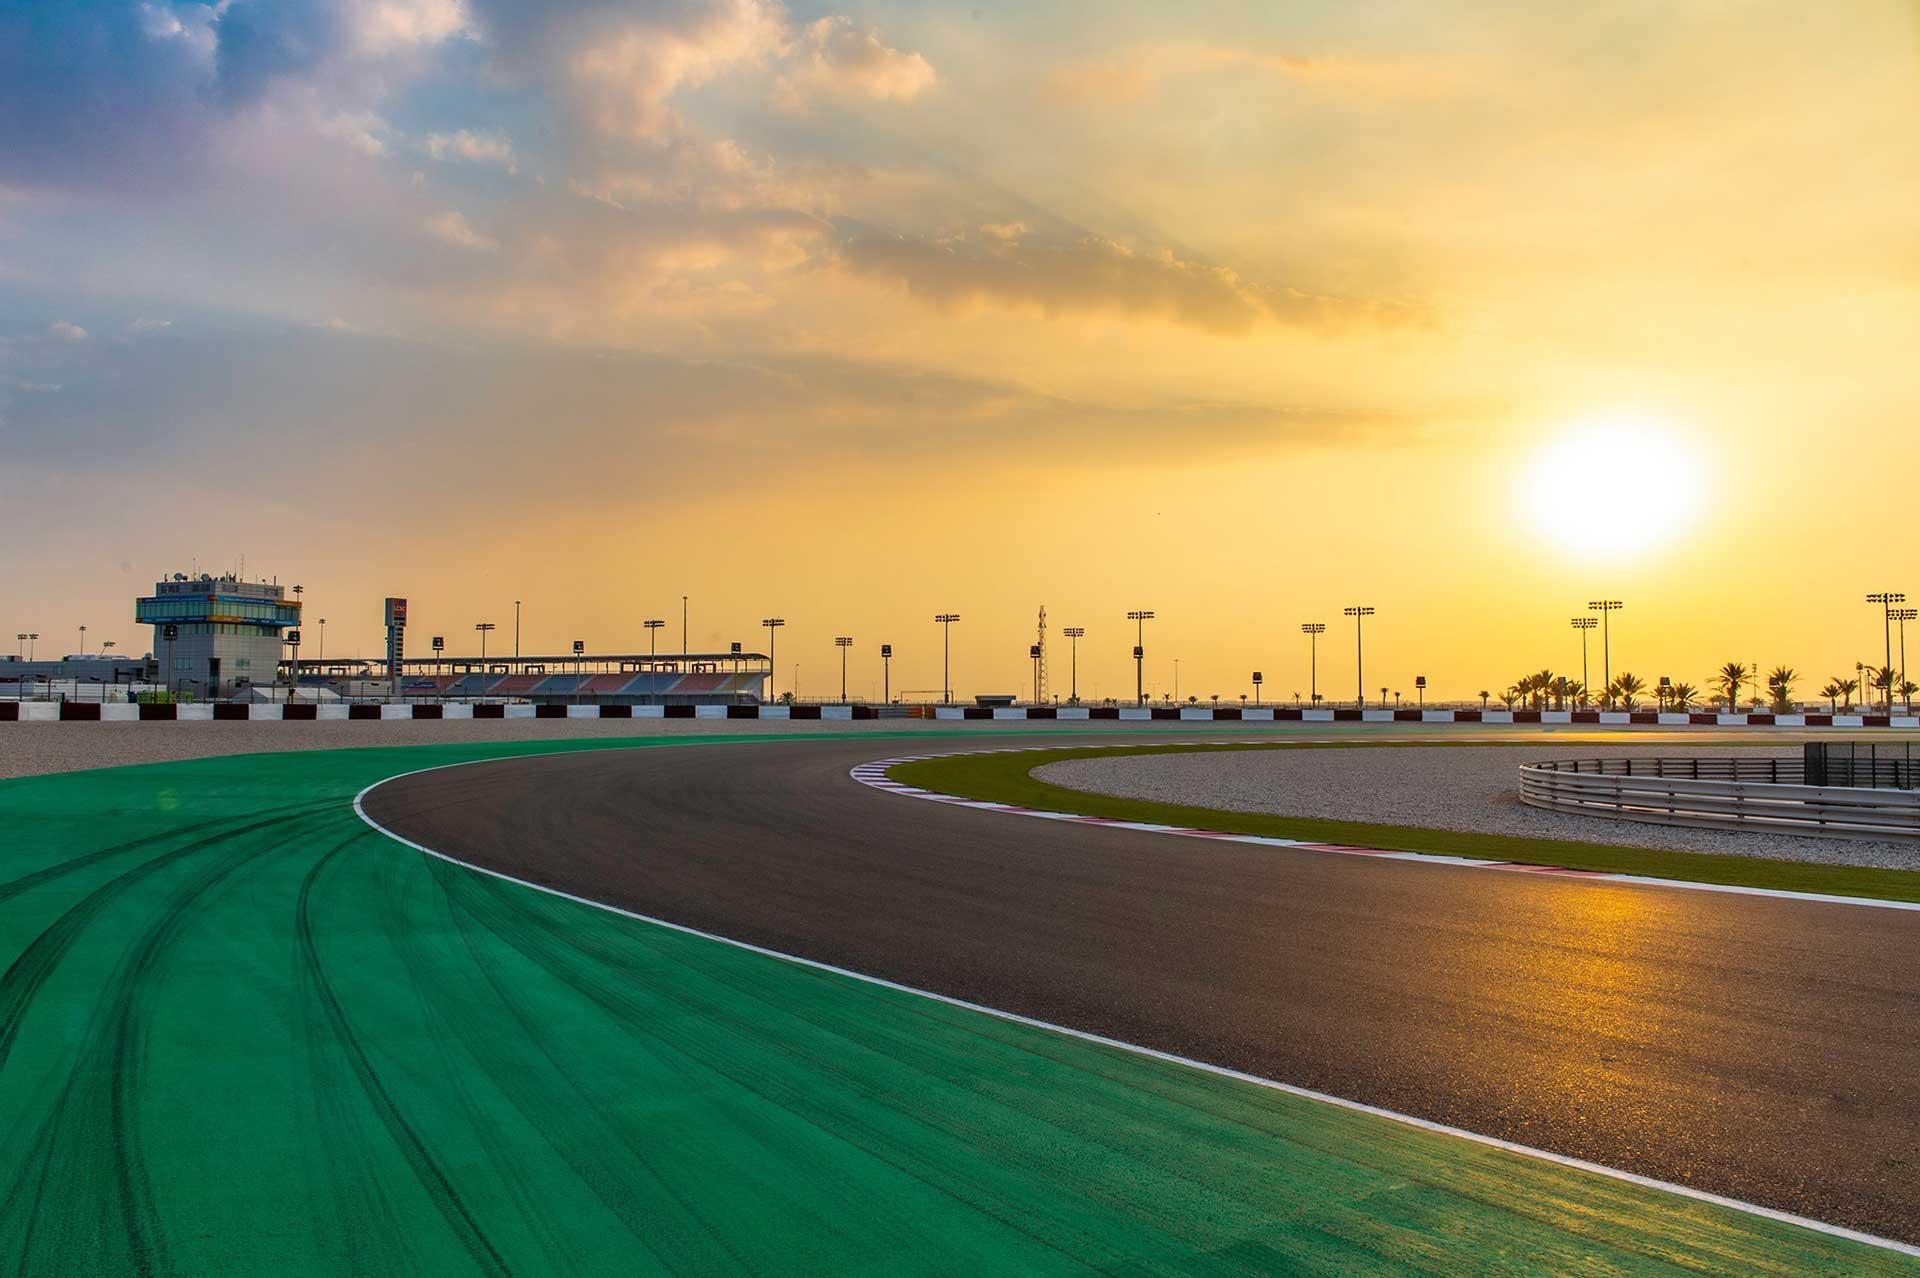 2021 Formula 1 Grand Prix of Qatar travel packages